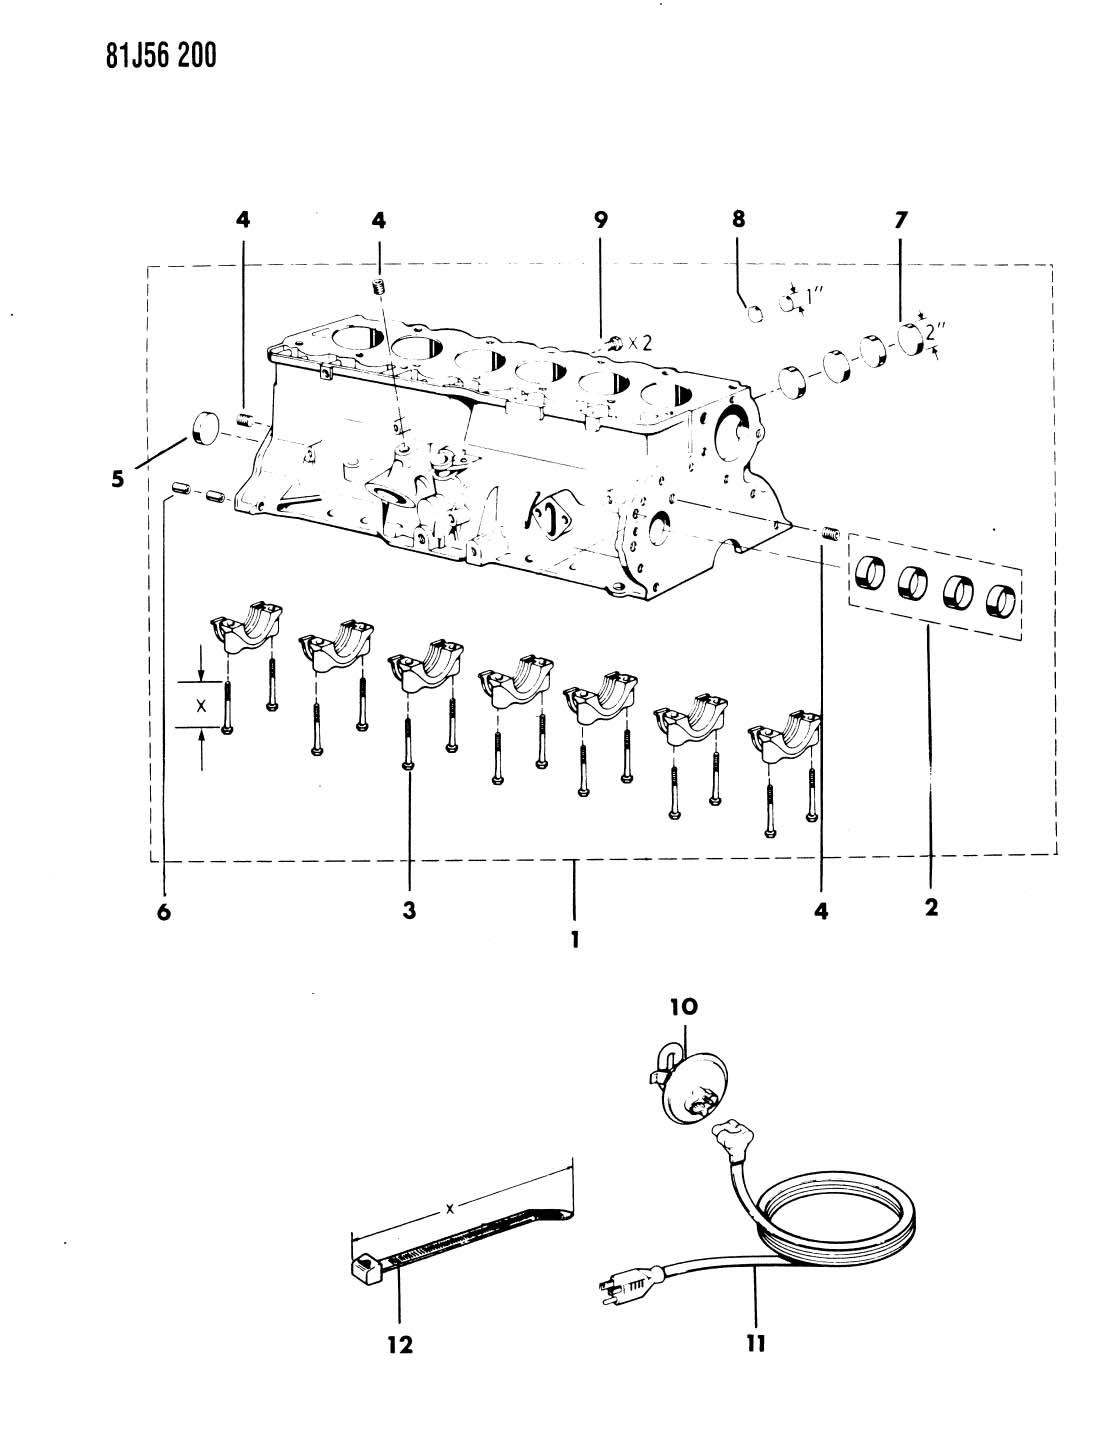 2004 Jeep Wrangler Engine Block Heater For 4 0l I6 Engine